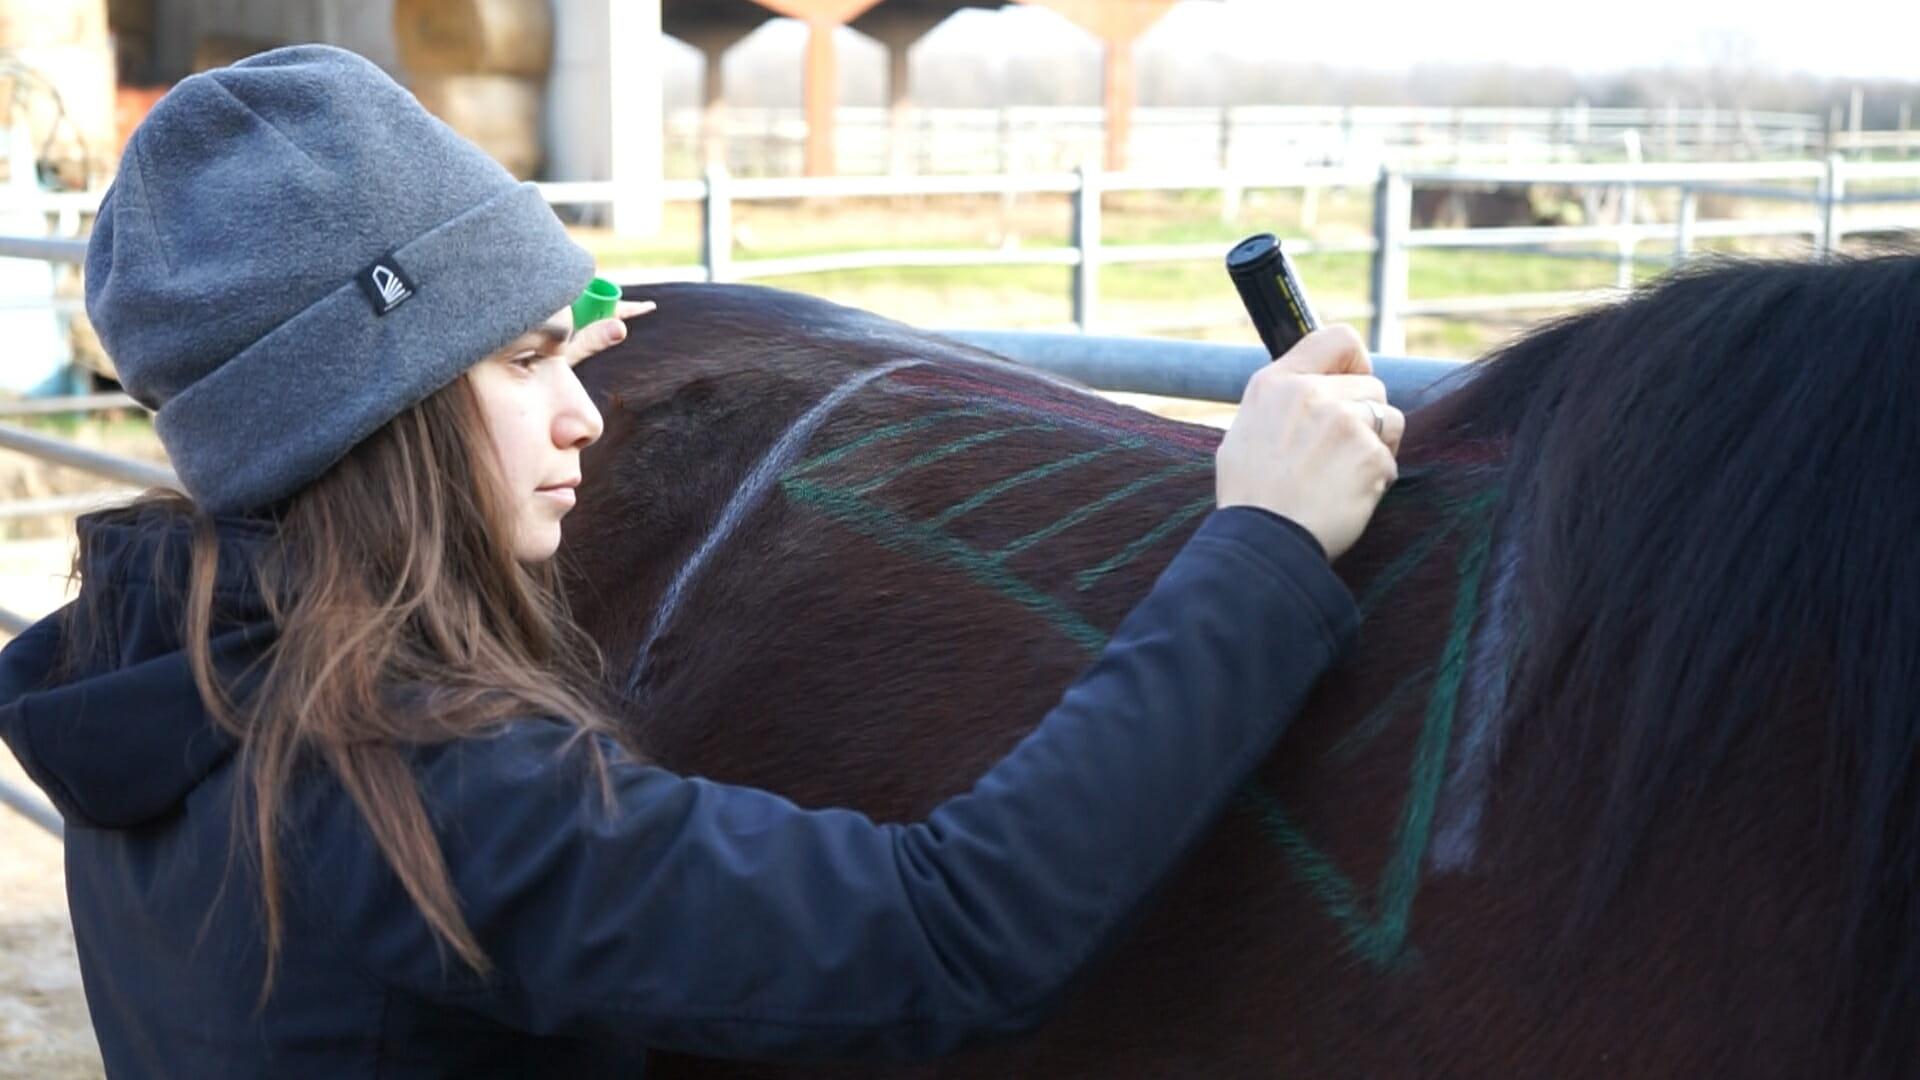 Ilaria saddle service - saddle fitting - selle su misura - consulenze